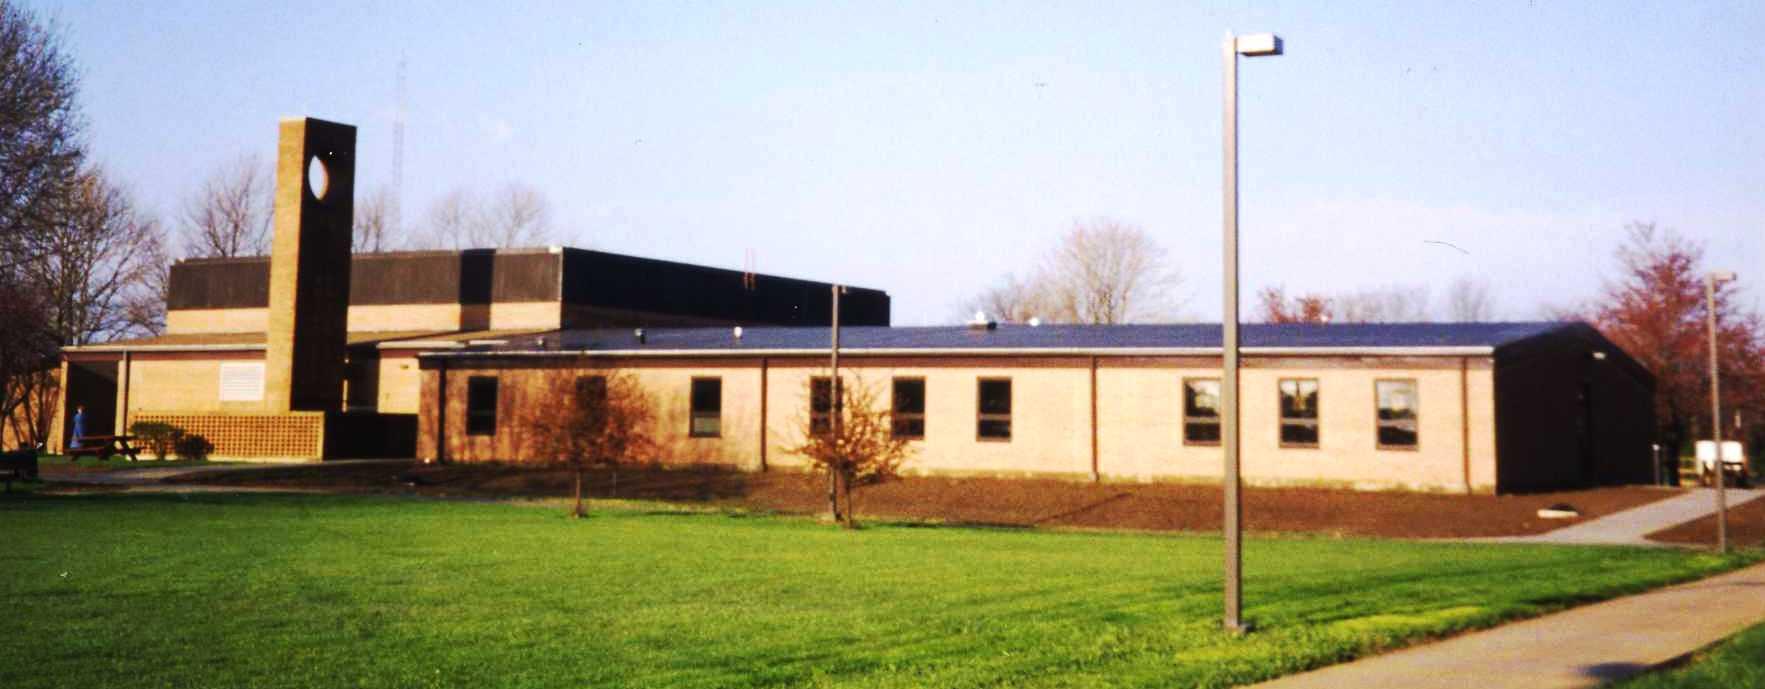 1997-1998 Blanchard Valley Addition.jpg